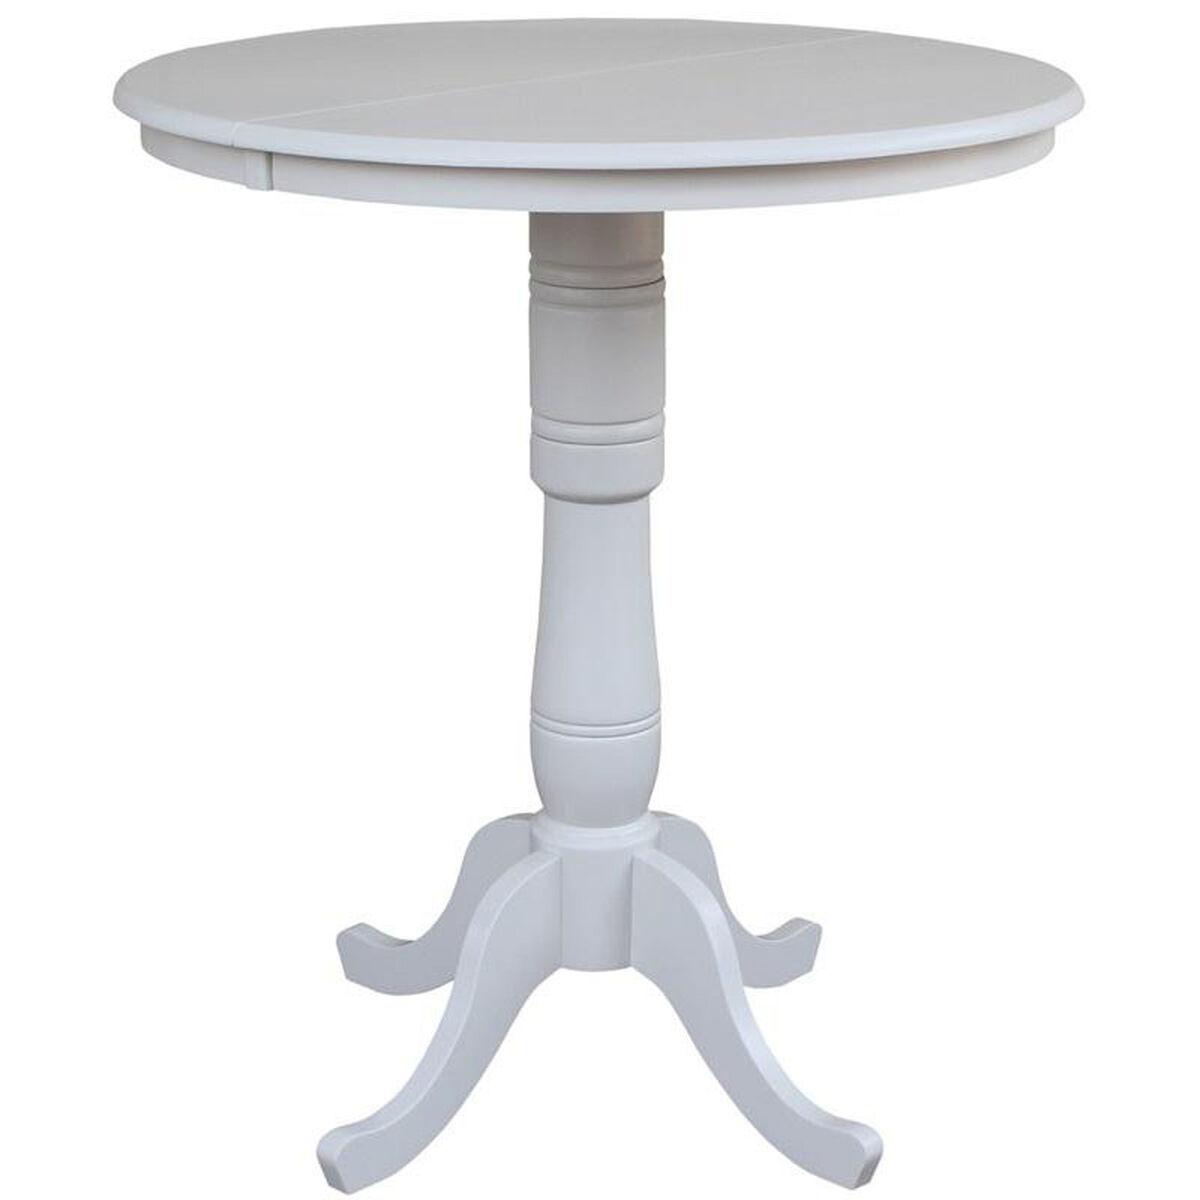 Solid Wood Pedestal Dining Table KRXTB Bizchaircom - 36 diameter dining table